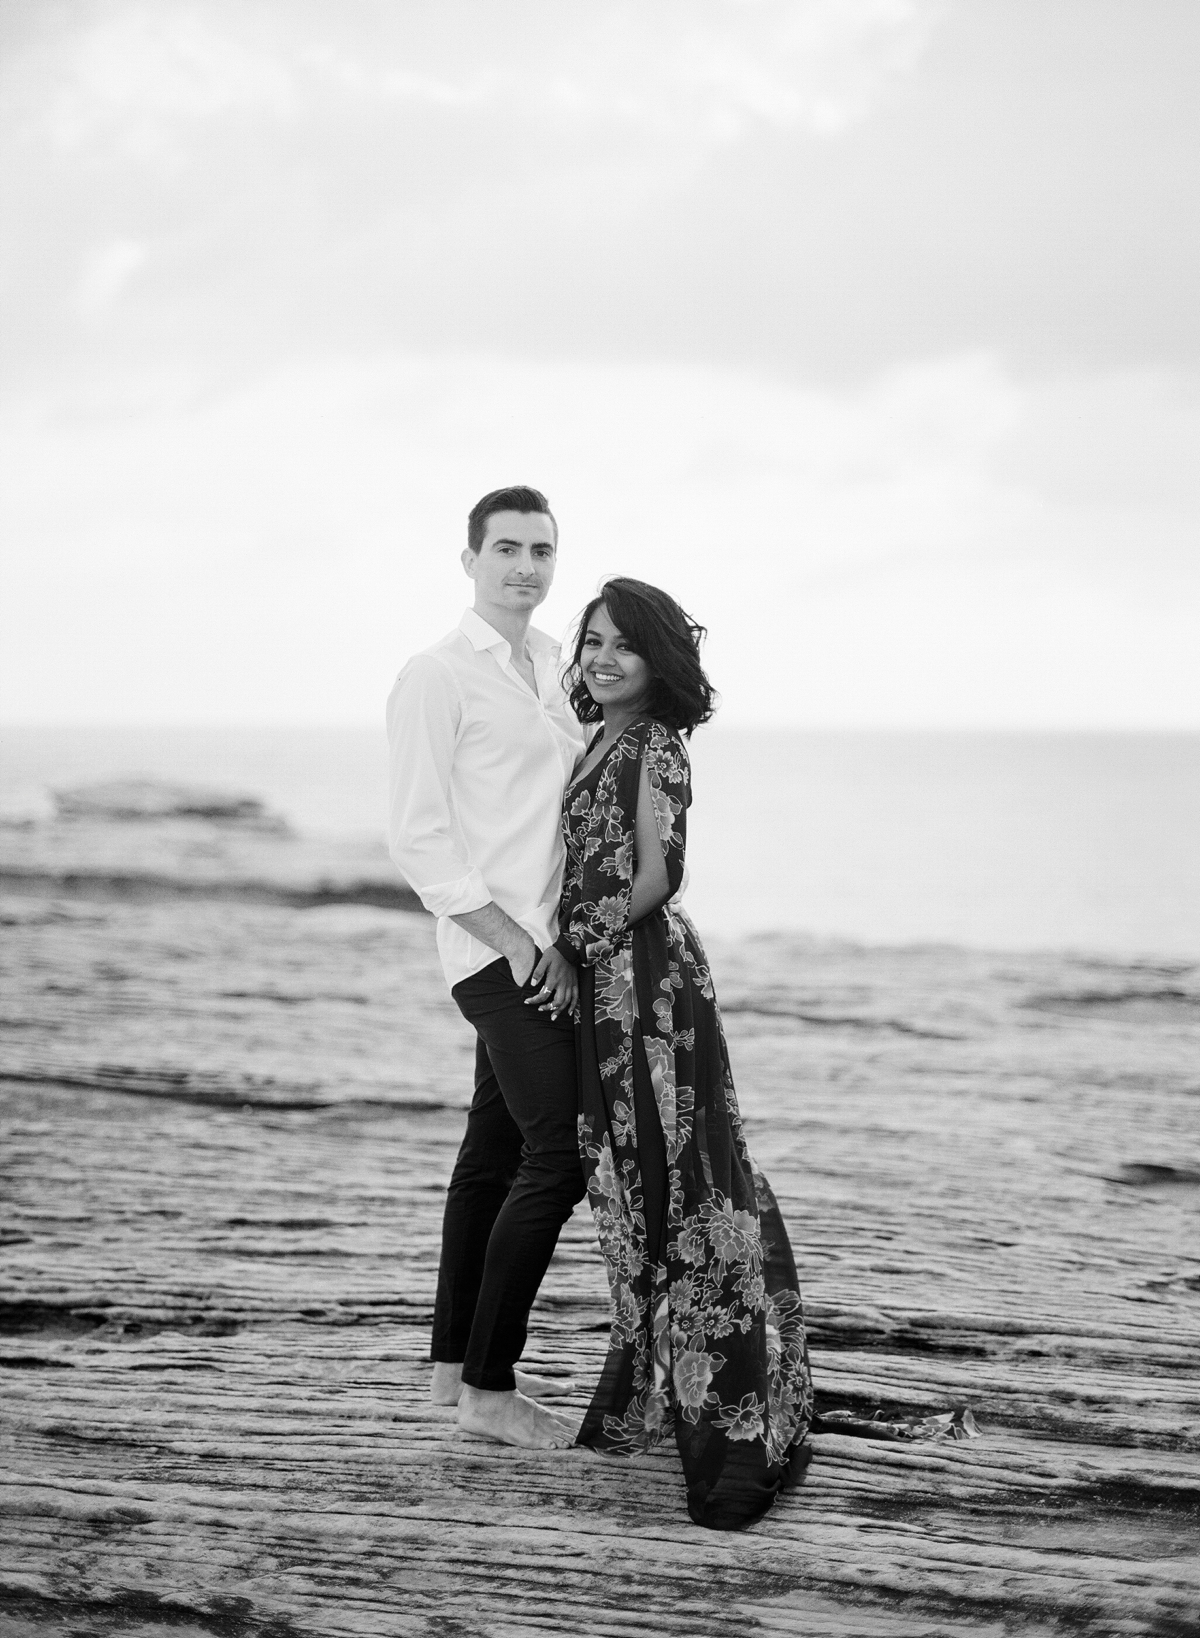 Coastal Sydney couples session by Mr Edwards Photography_0737_1175.jpg